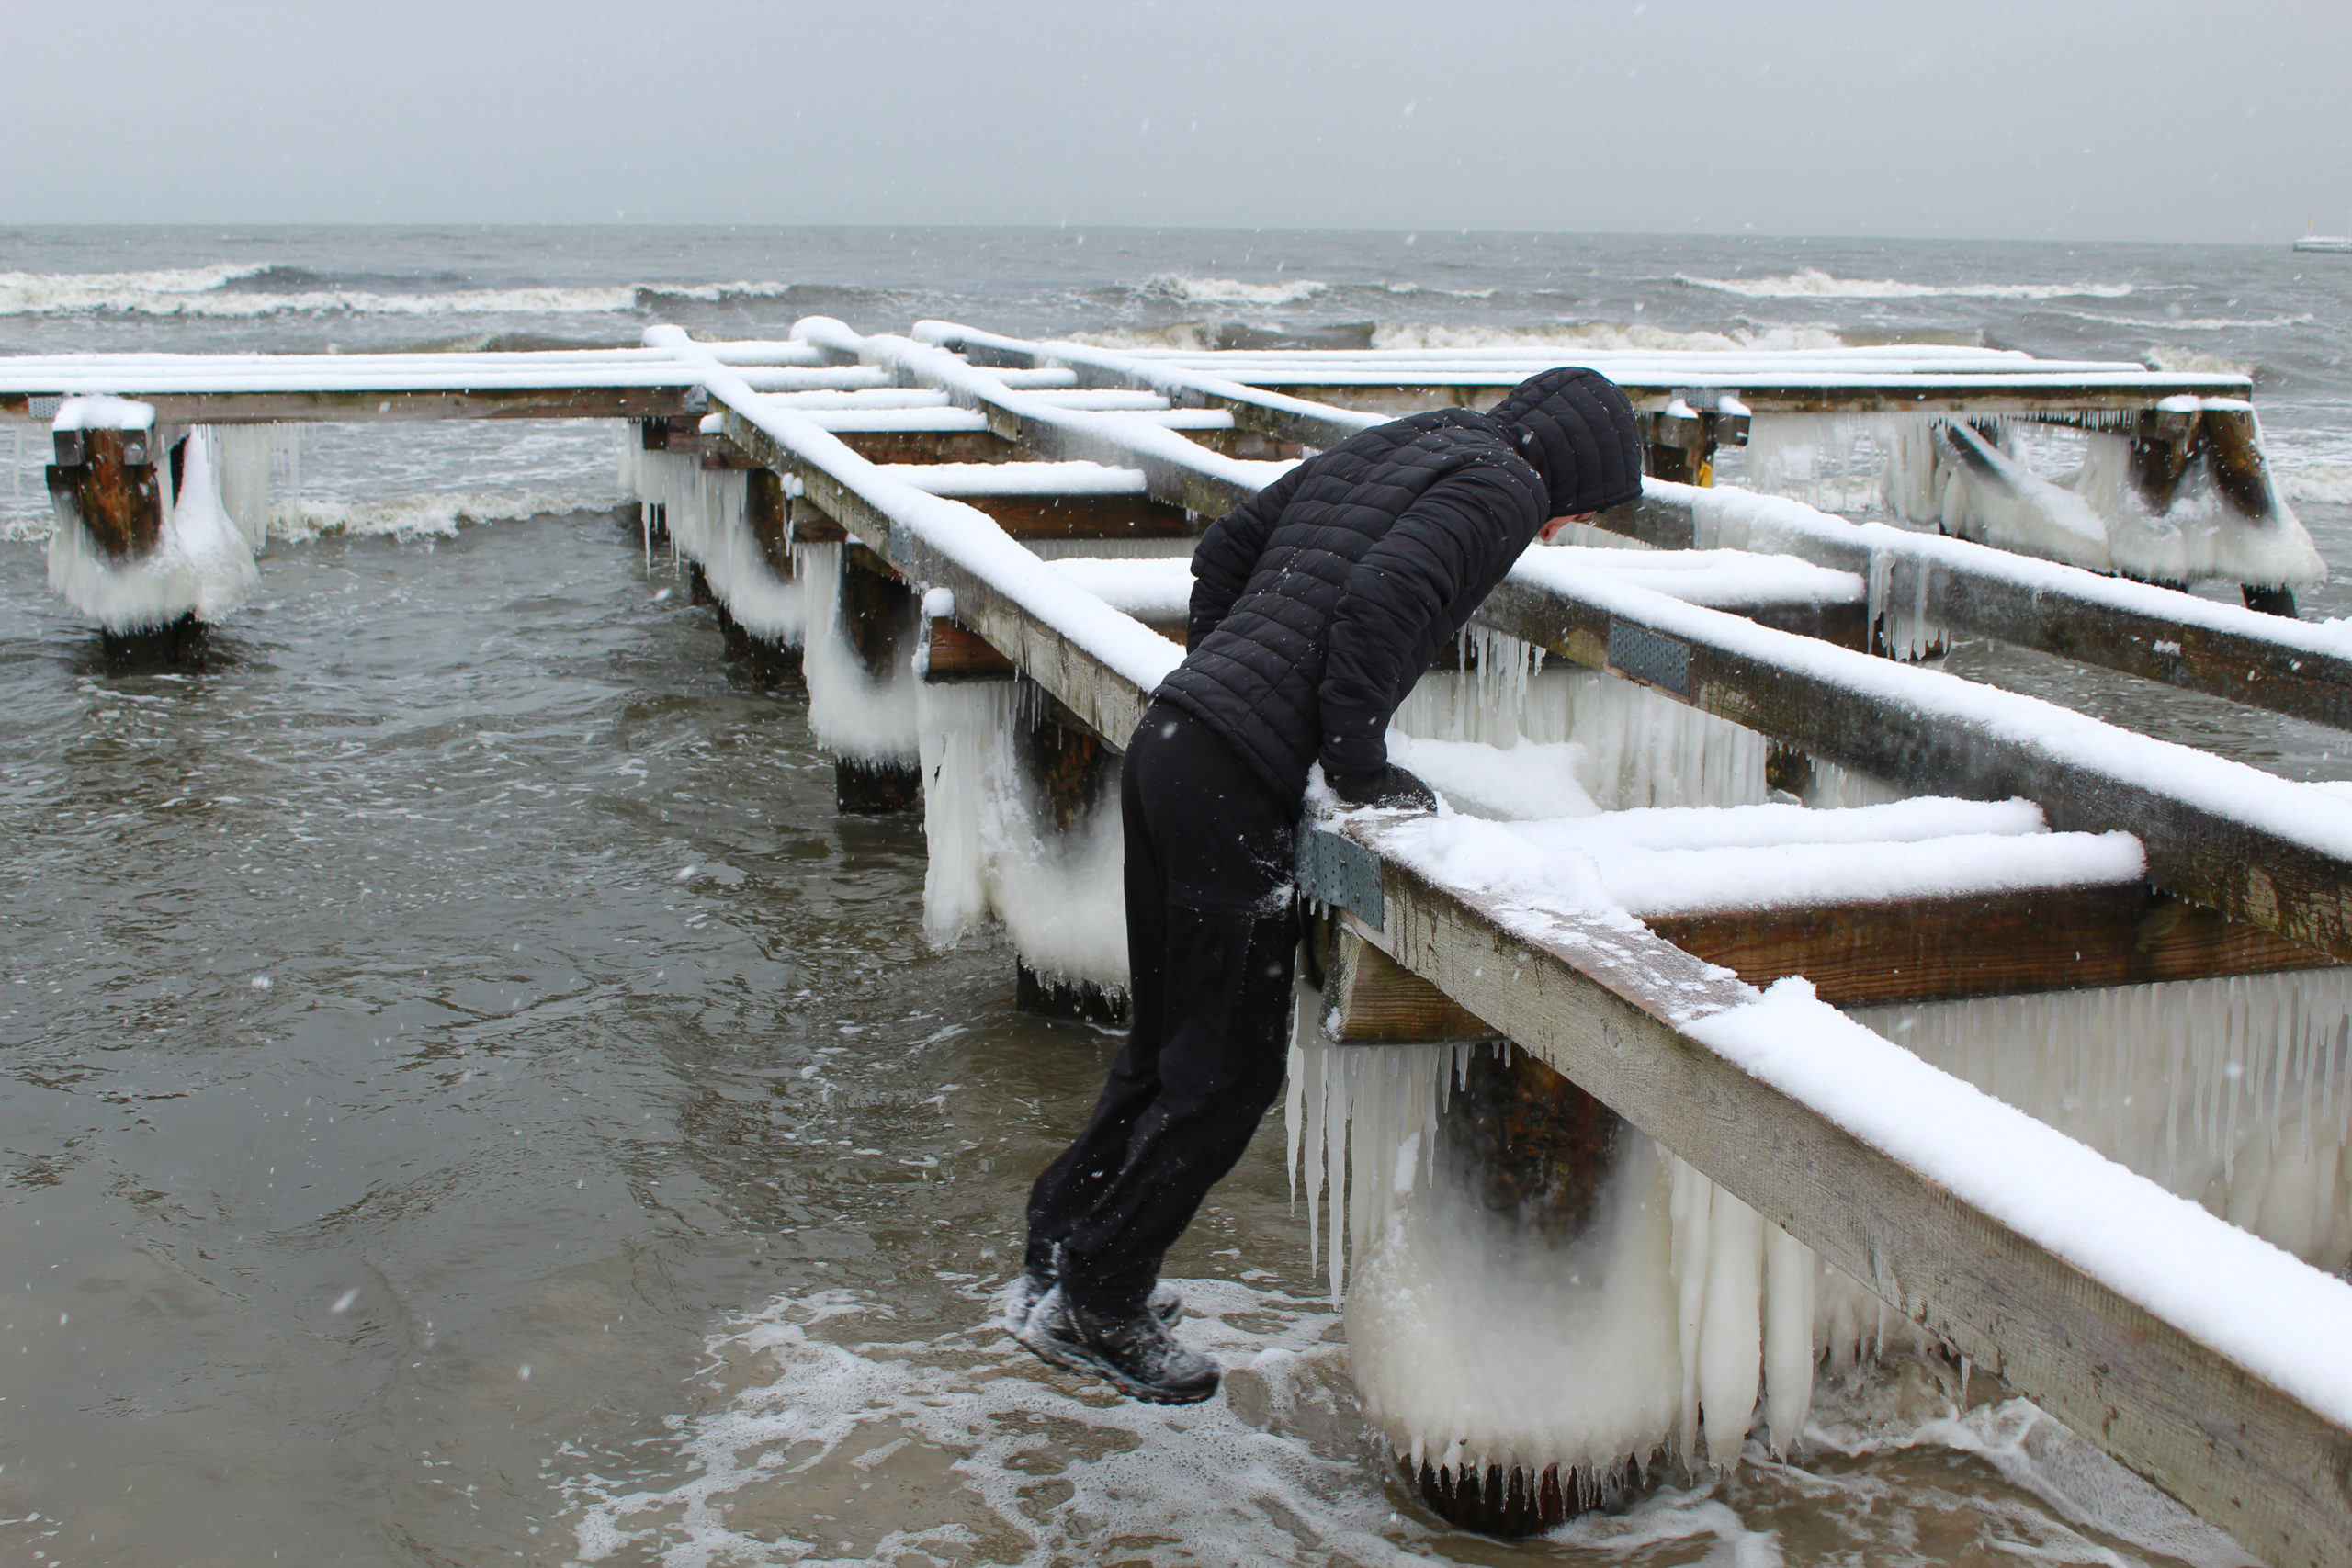 chłopak wspina się na platformę mola